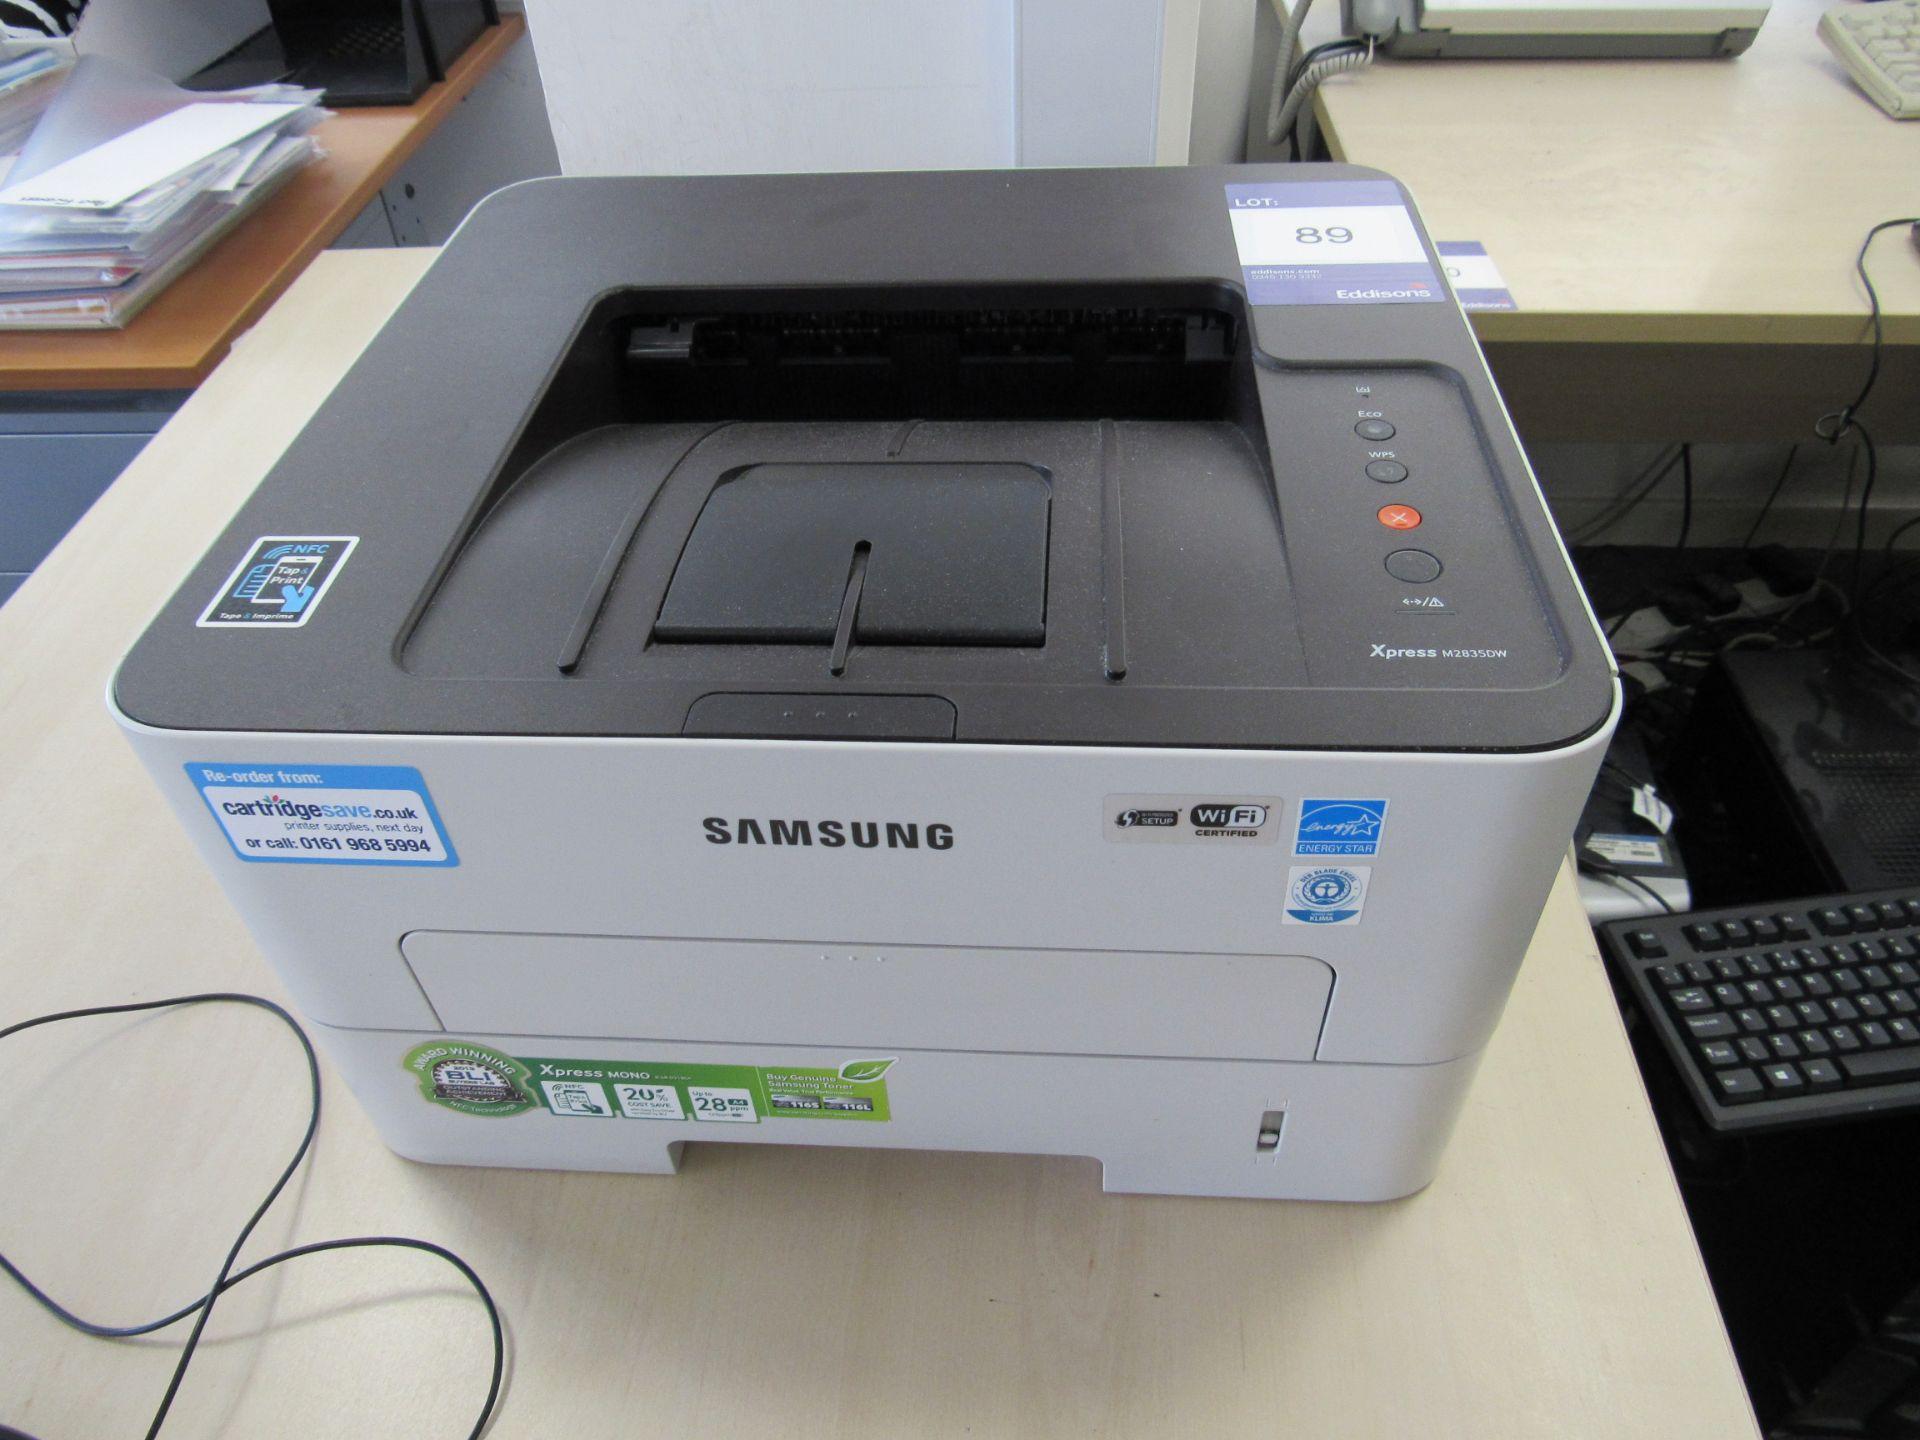 Samsung Xpress M2835DW printer - Image 2 of 3